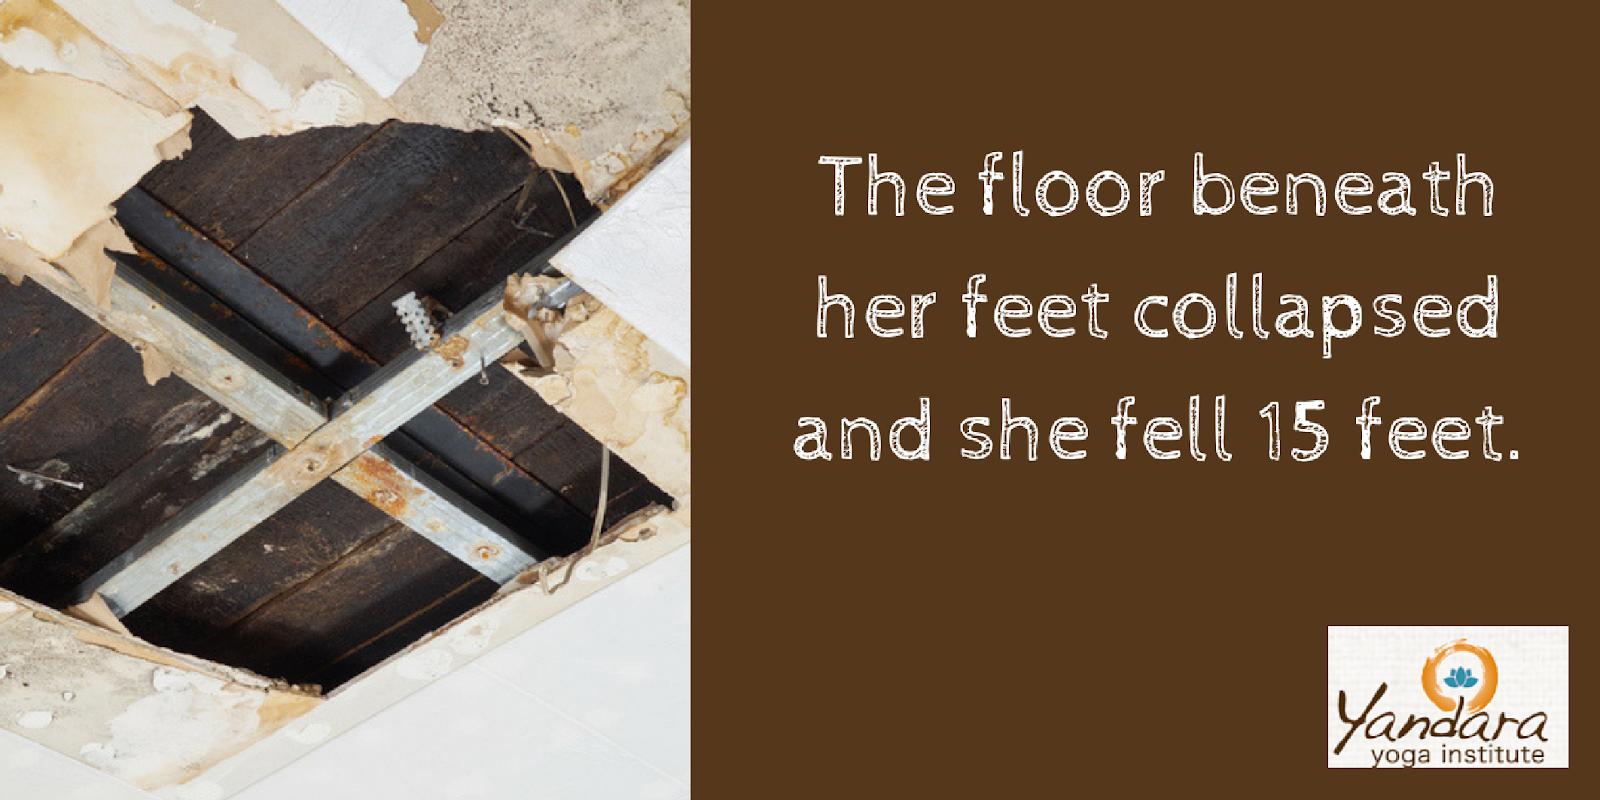 She fell 15 feet.